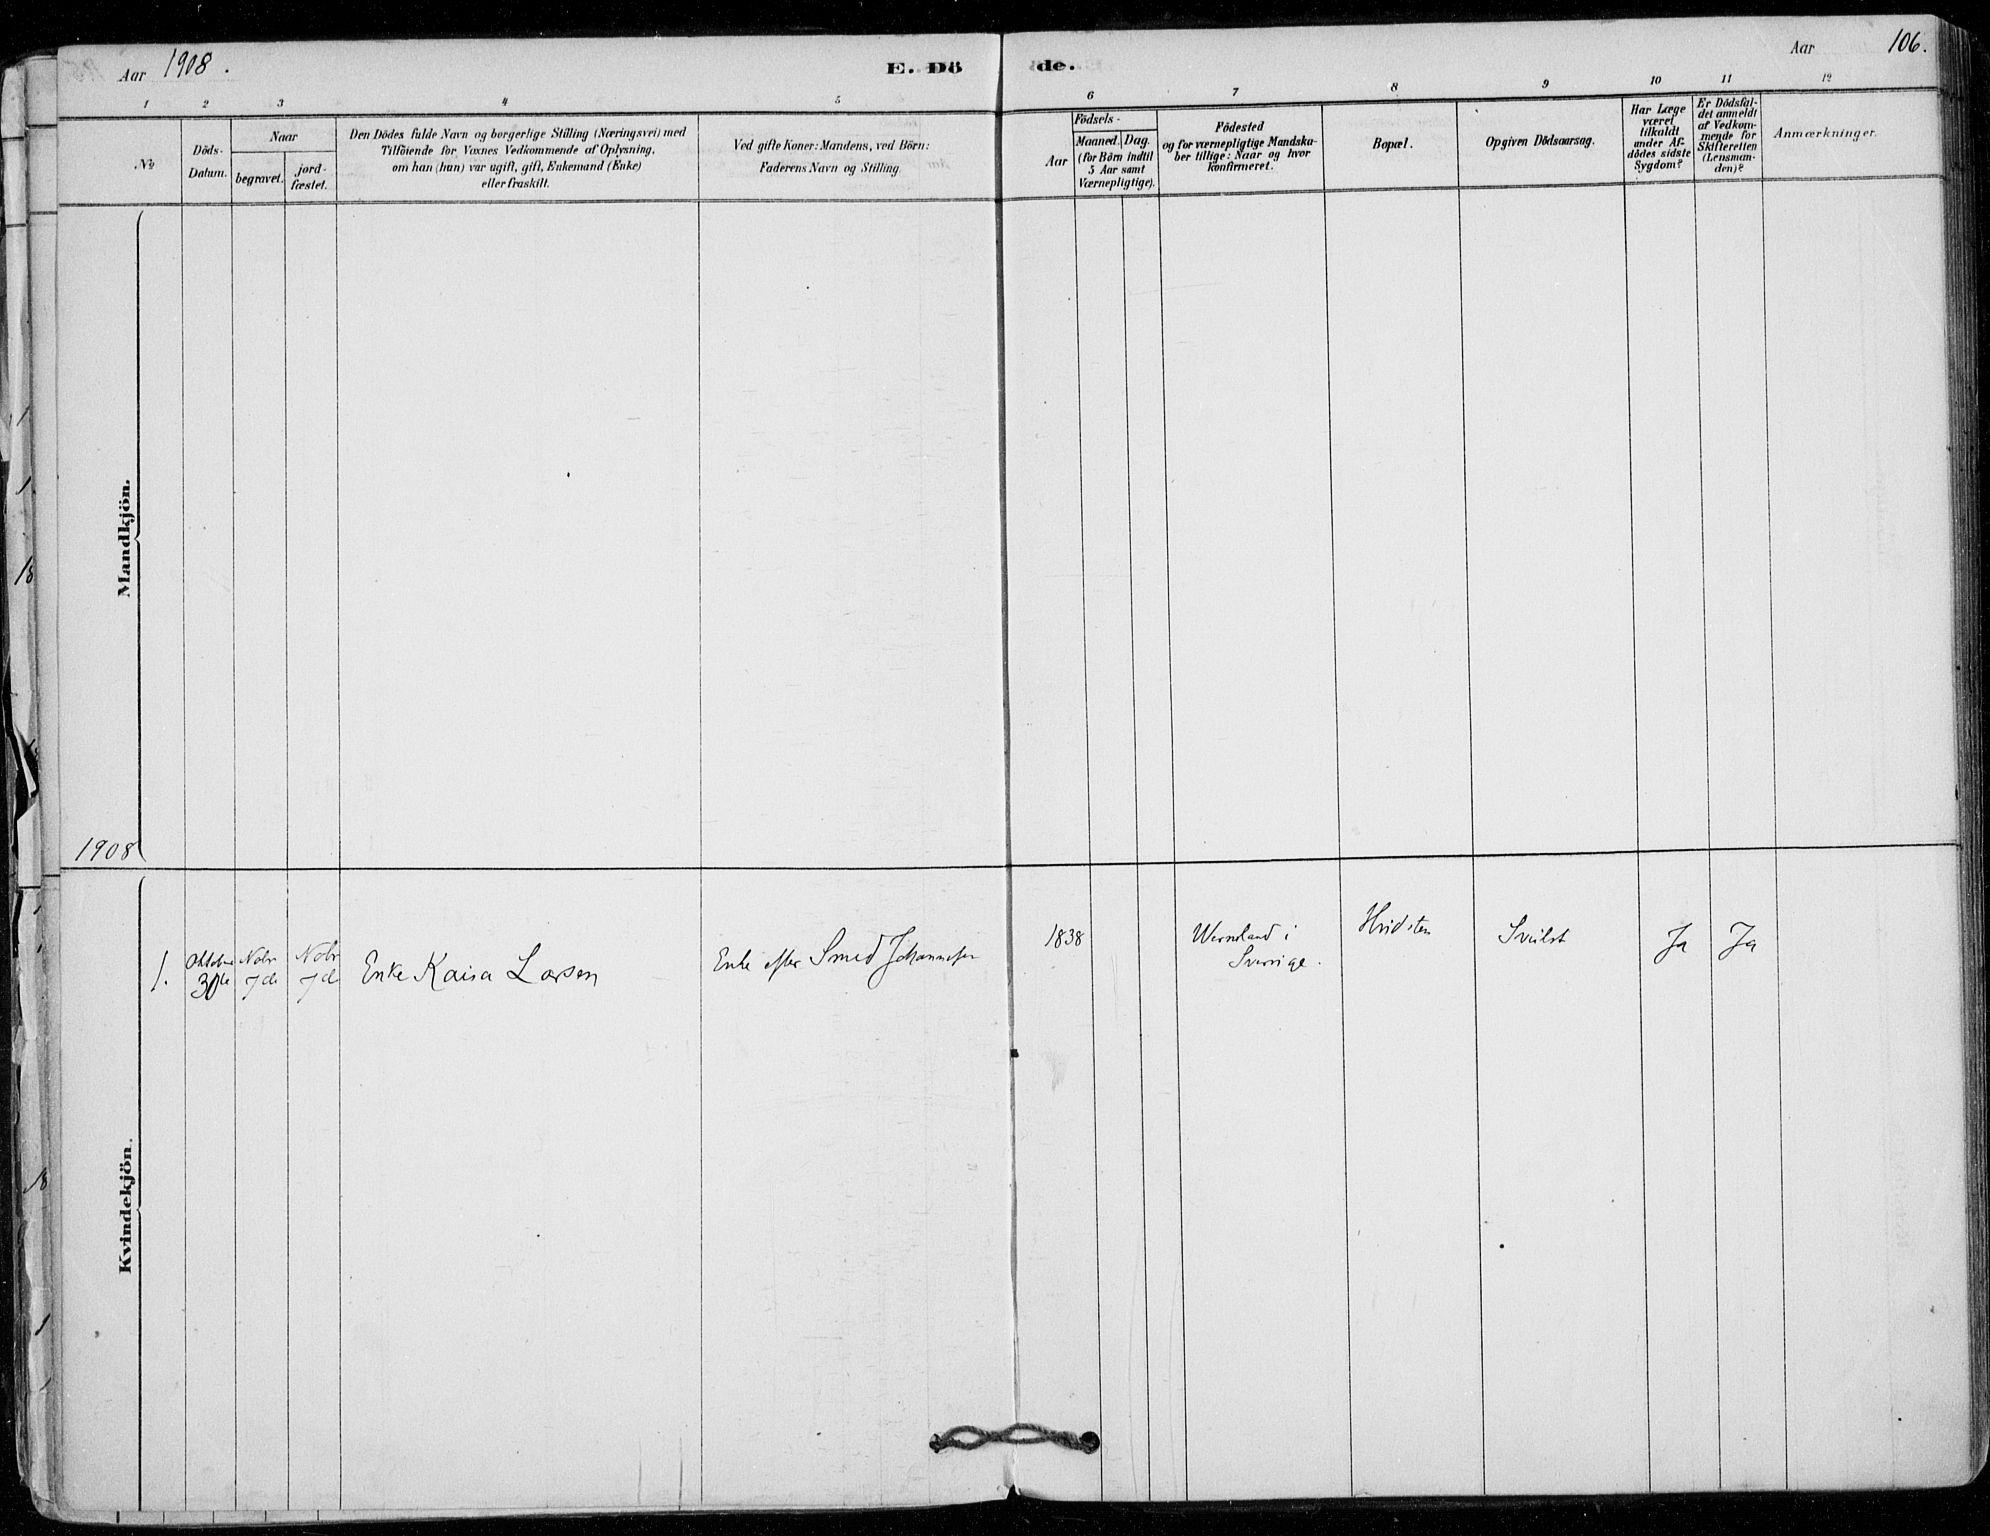 SAO, Vestby prestekontor Kirkebøker, F/Fd/L0001: Ministerialbok nr. IV 1, 1878-1945, s. 106